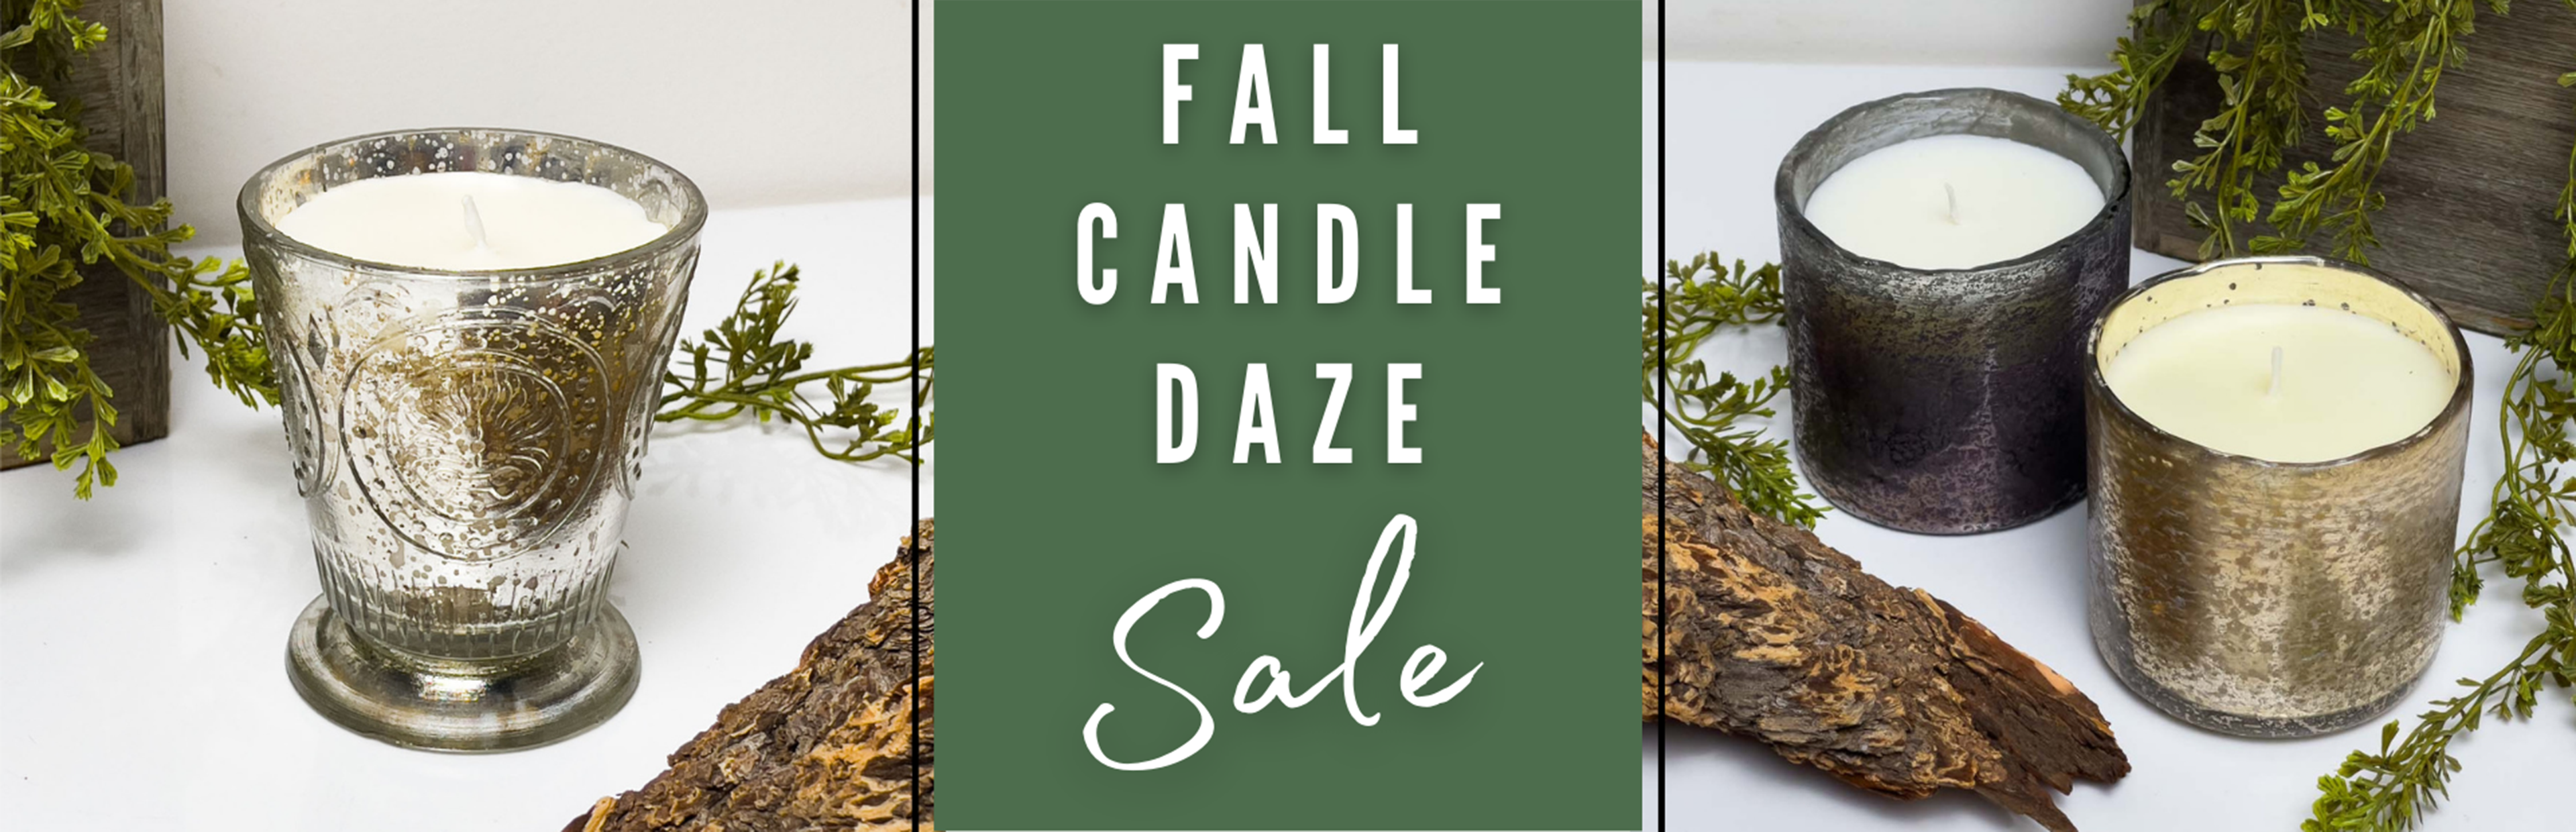 Fall Candle Daze Sale